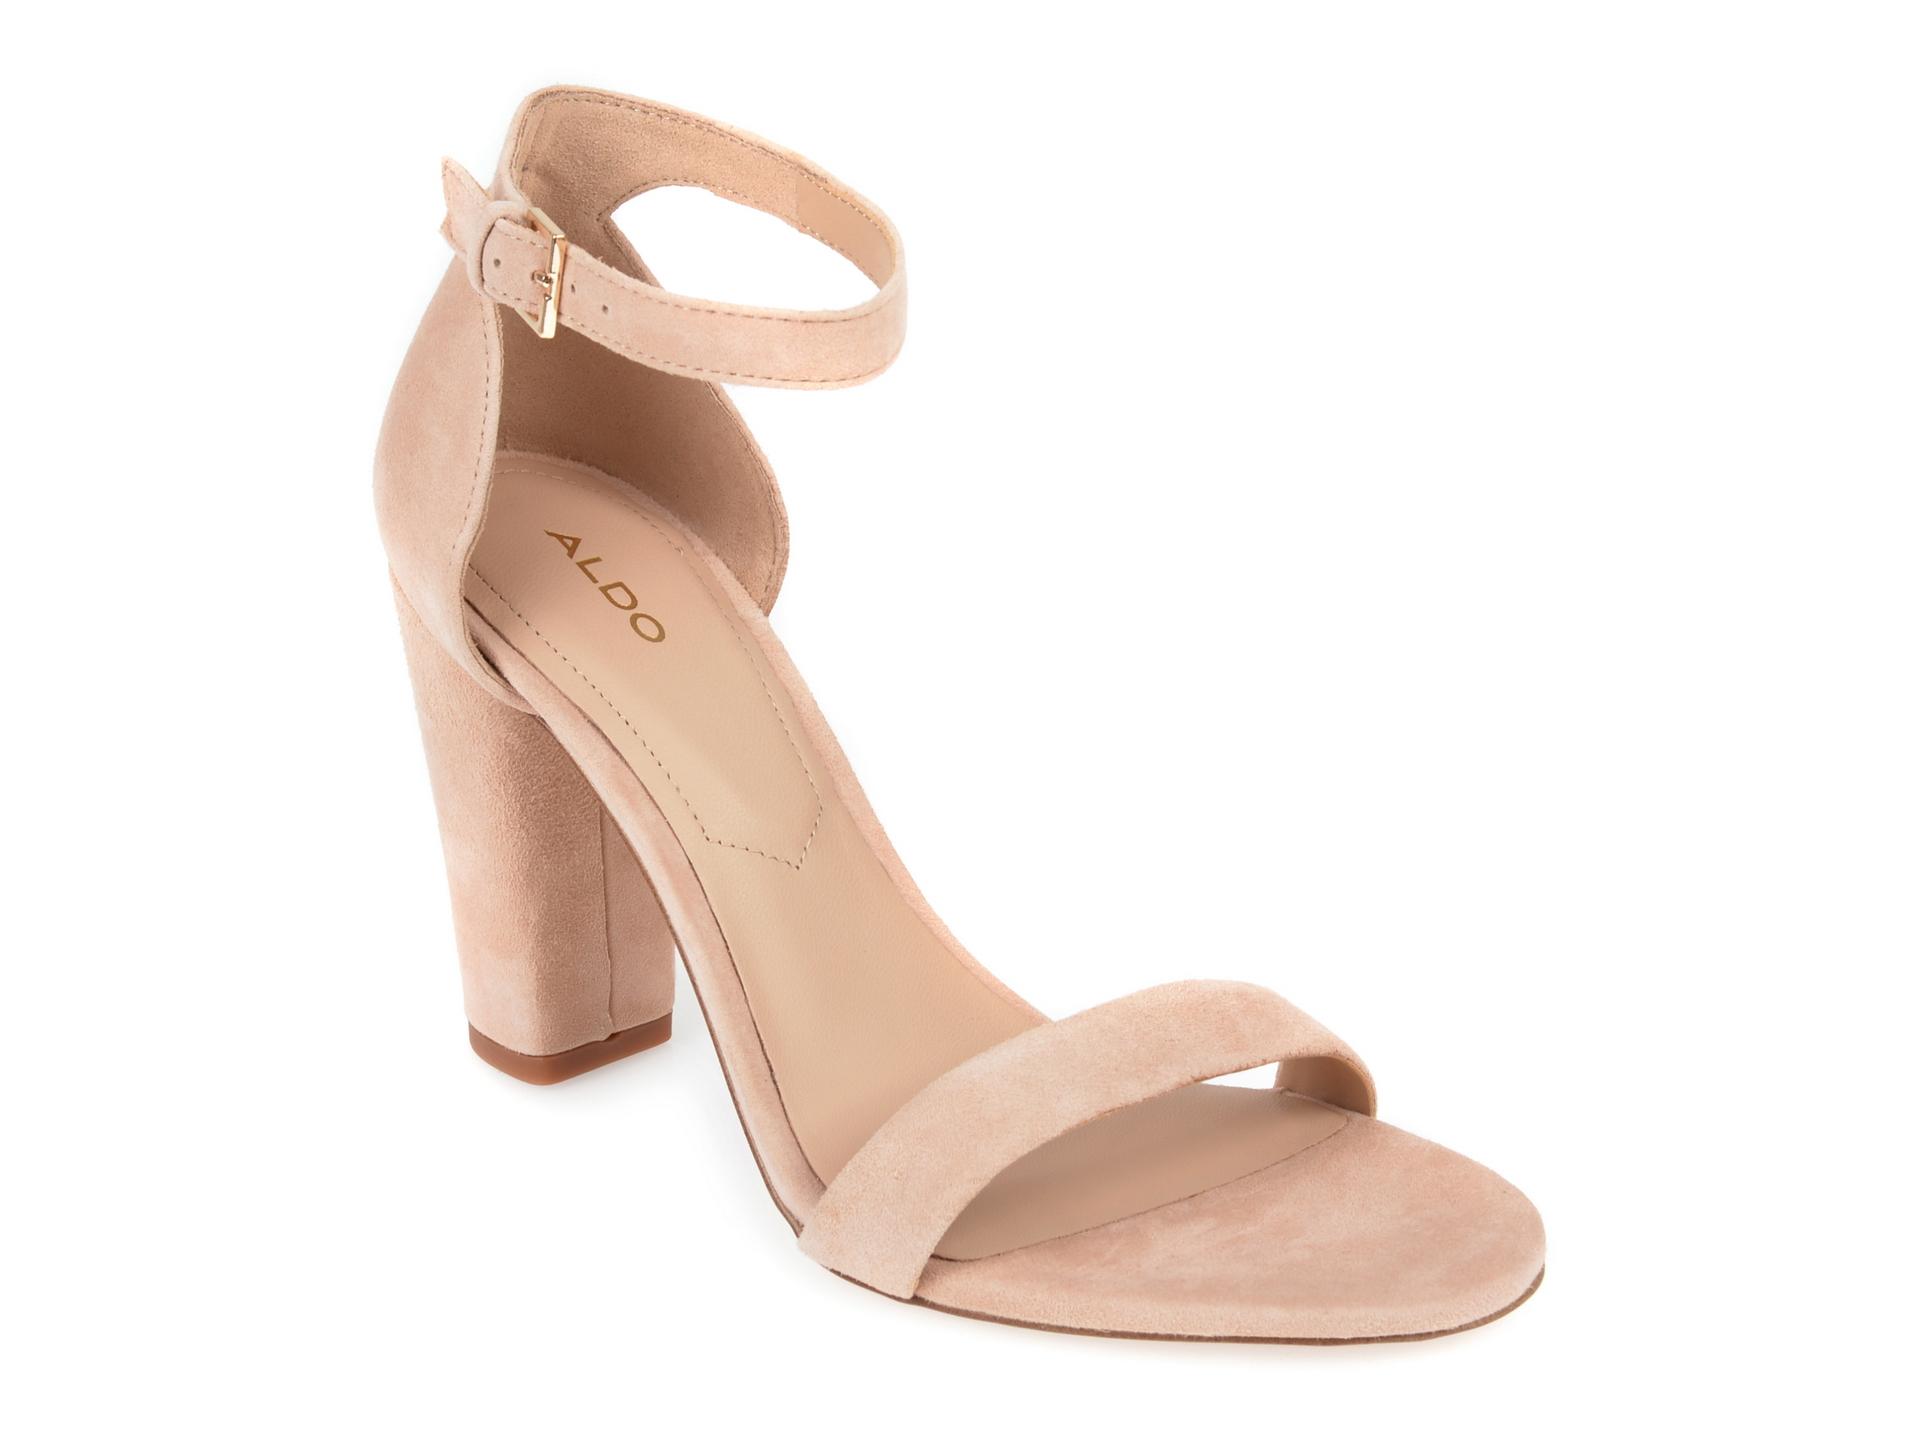 Sandale ALDO nude, Jerayclya270, din piele intoarsa